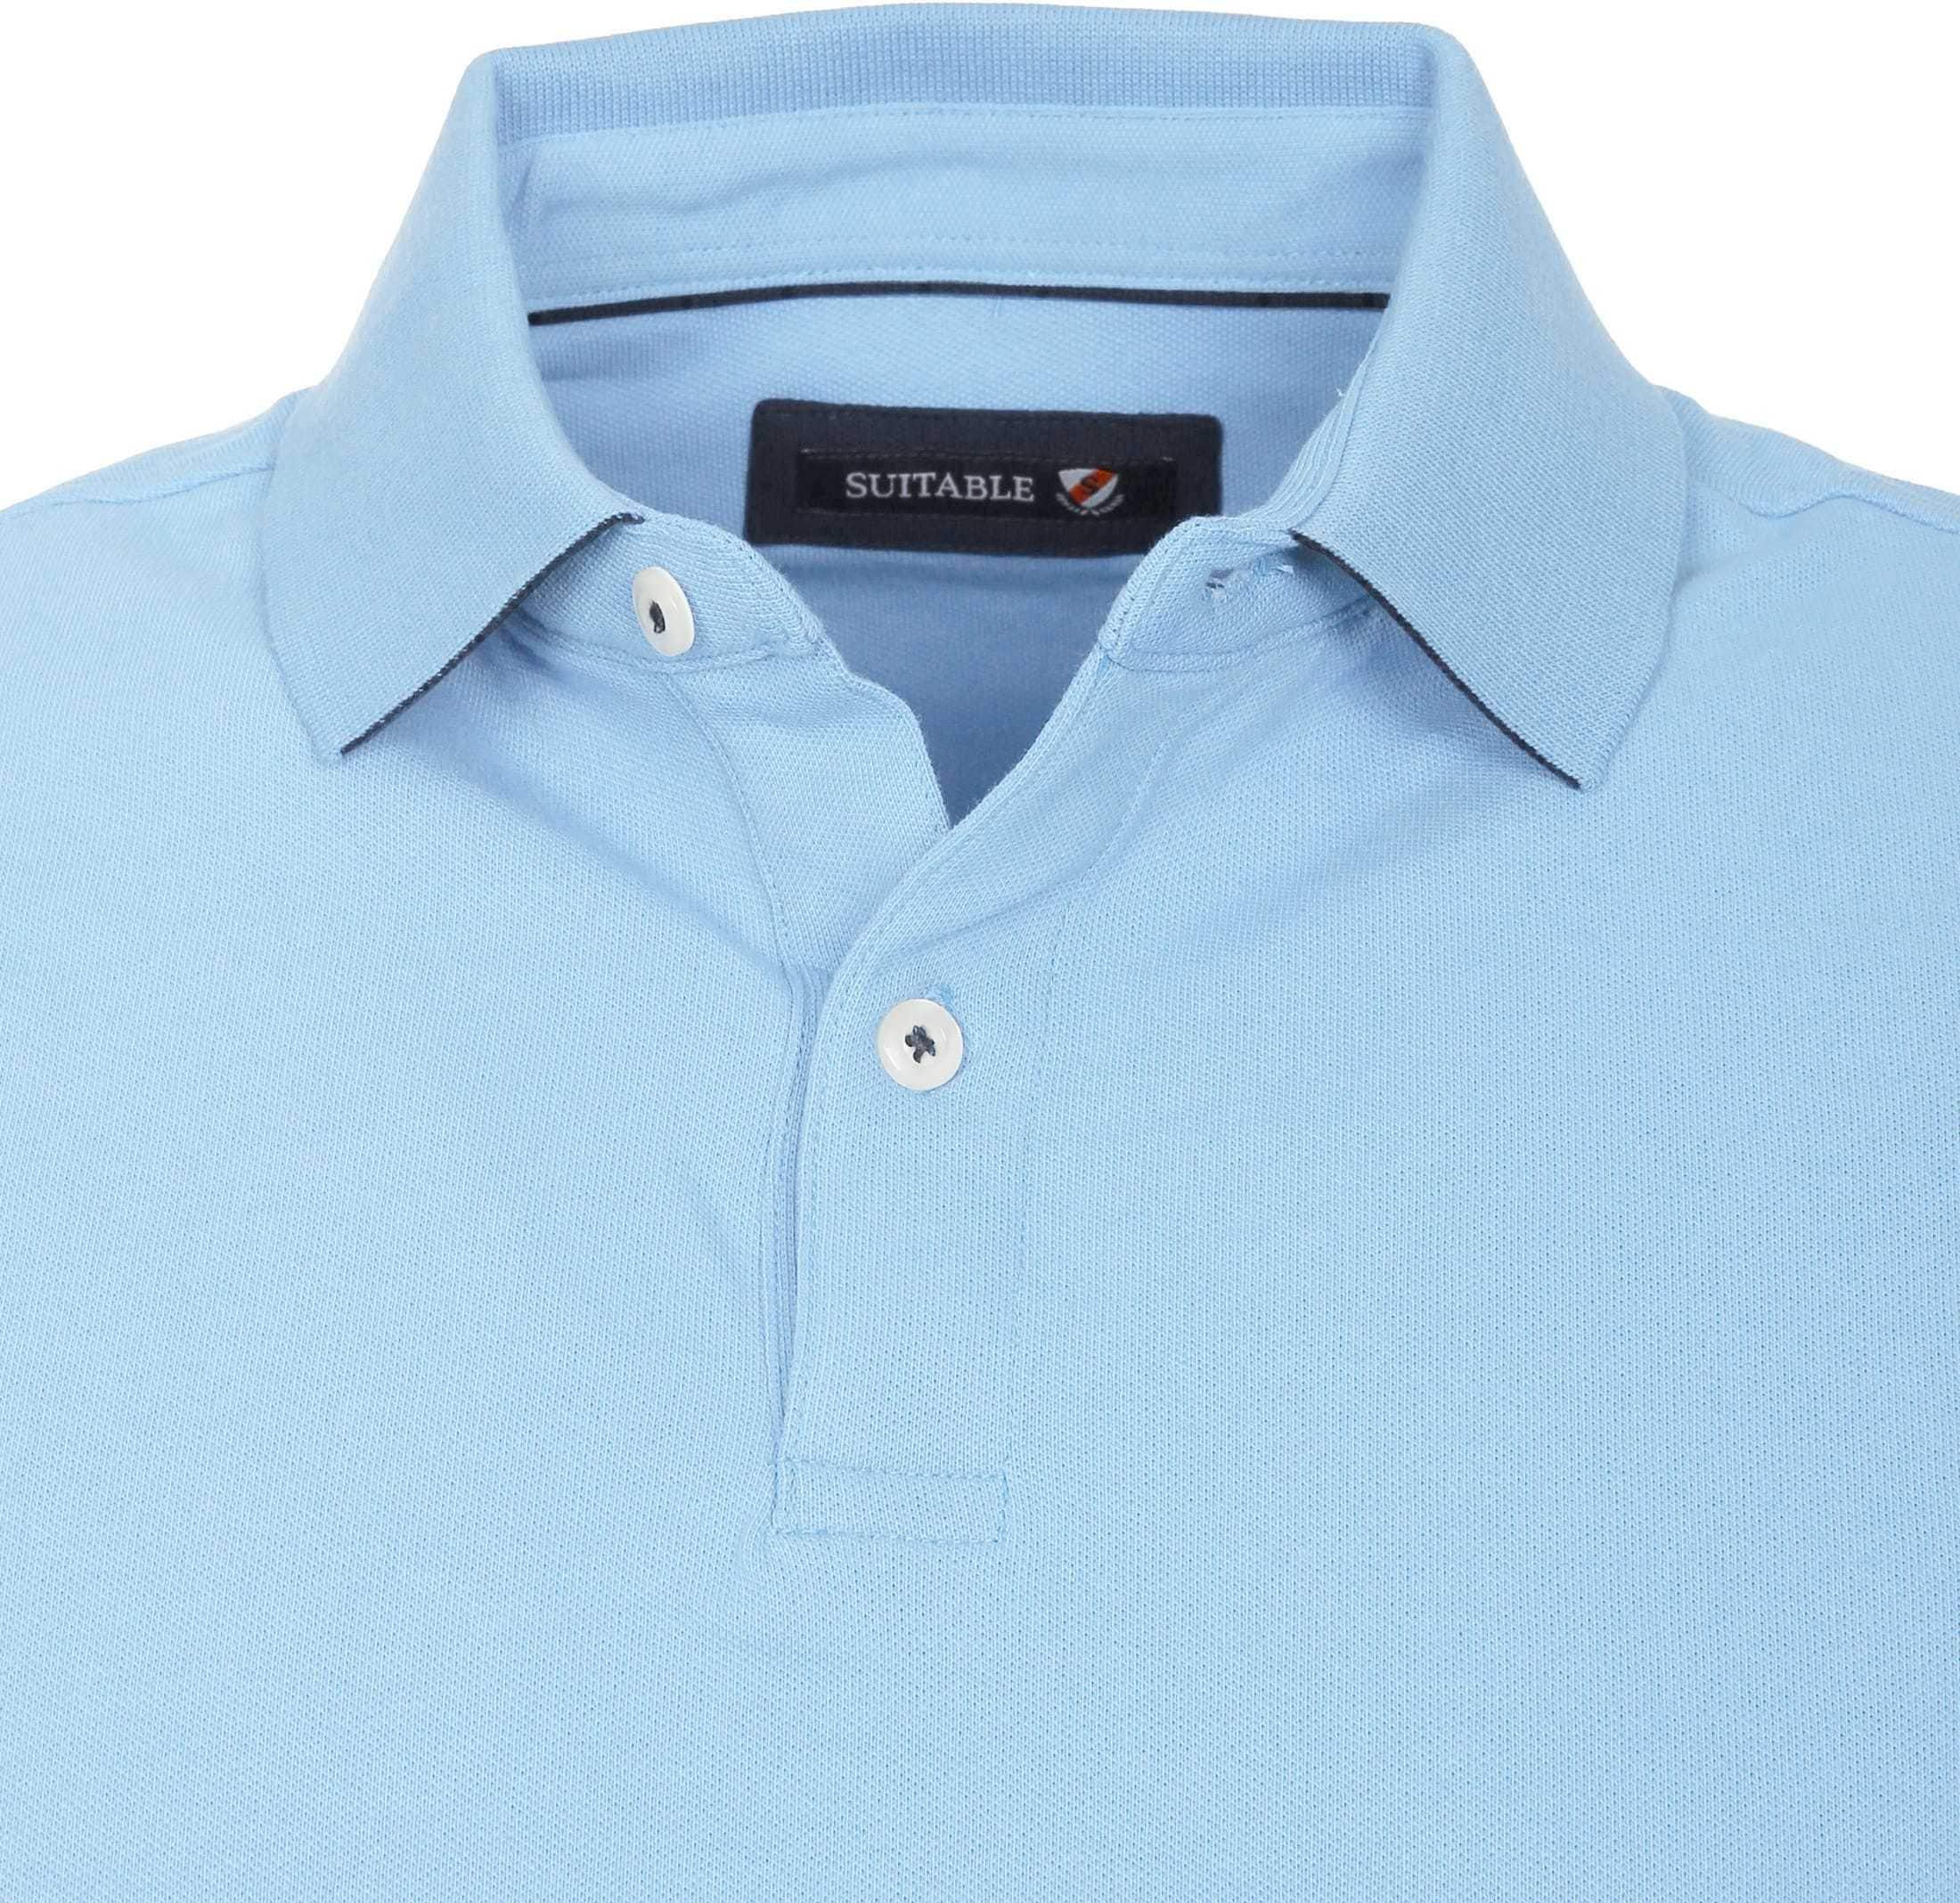 Suitable Polo Basic Lichtblauw foto 1